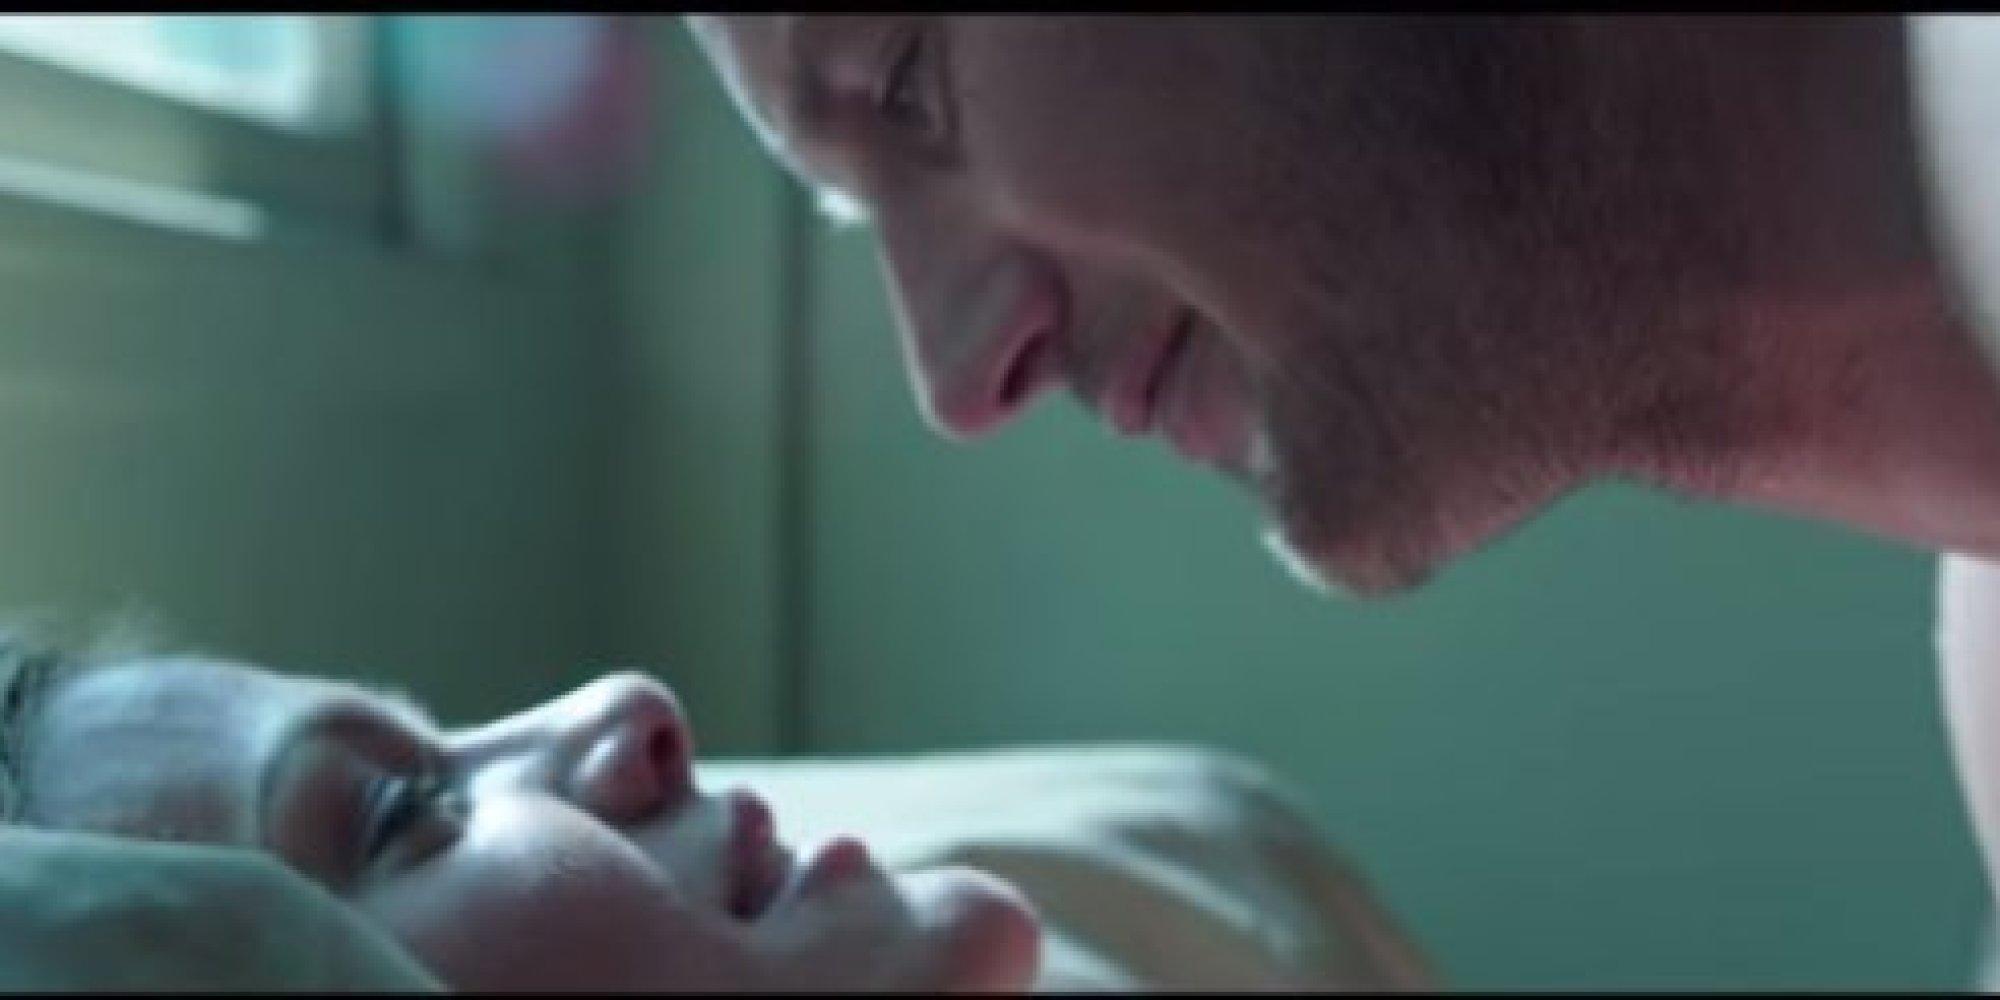 patrick wilson nude sex scenes